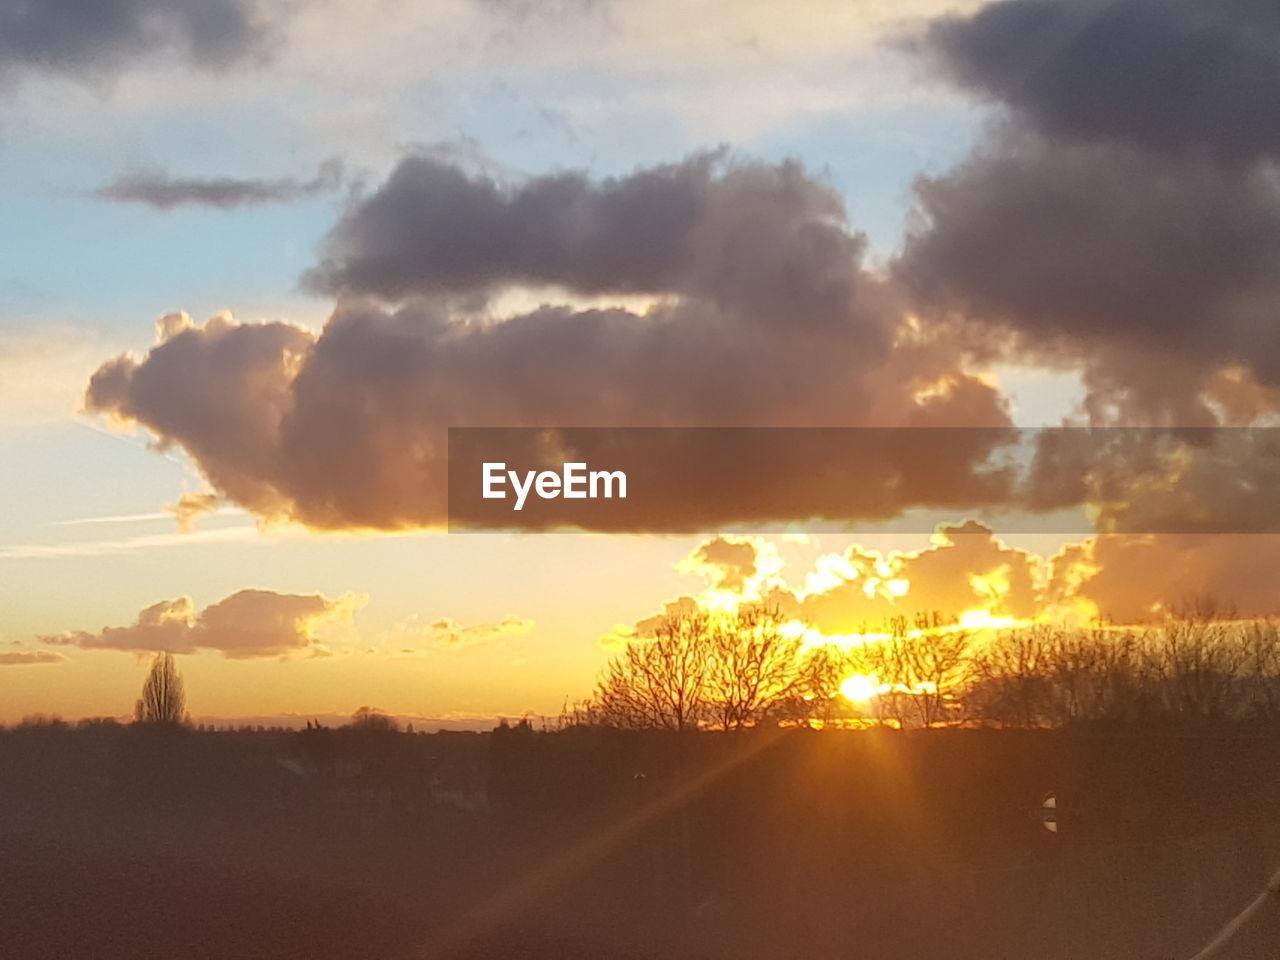 sunset, sky, sun, scenics, cloud - sky, landscape, tranquil scene, orange color, sunbeam, nature, no people, sunlight, tranquility, beauty in nature, silhouette, field, outdoors, road, tree, rural scene, day